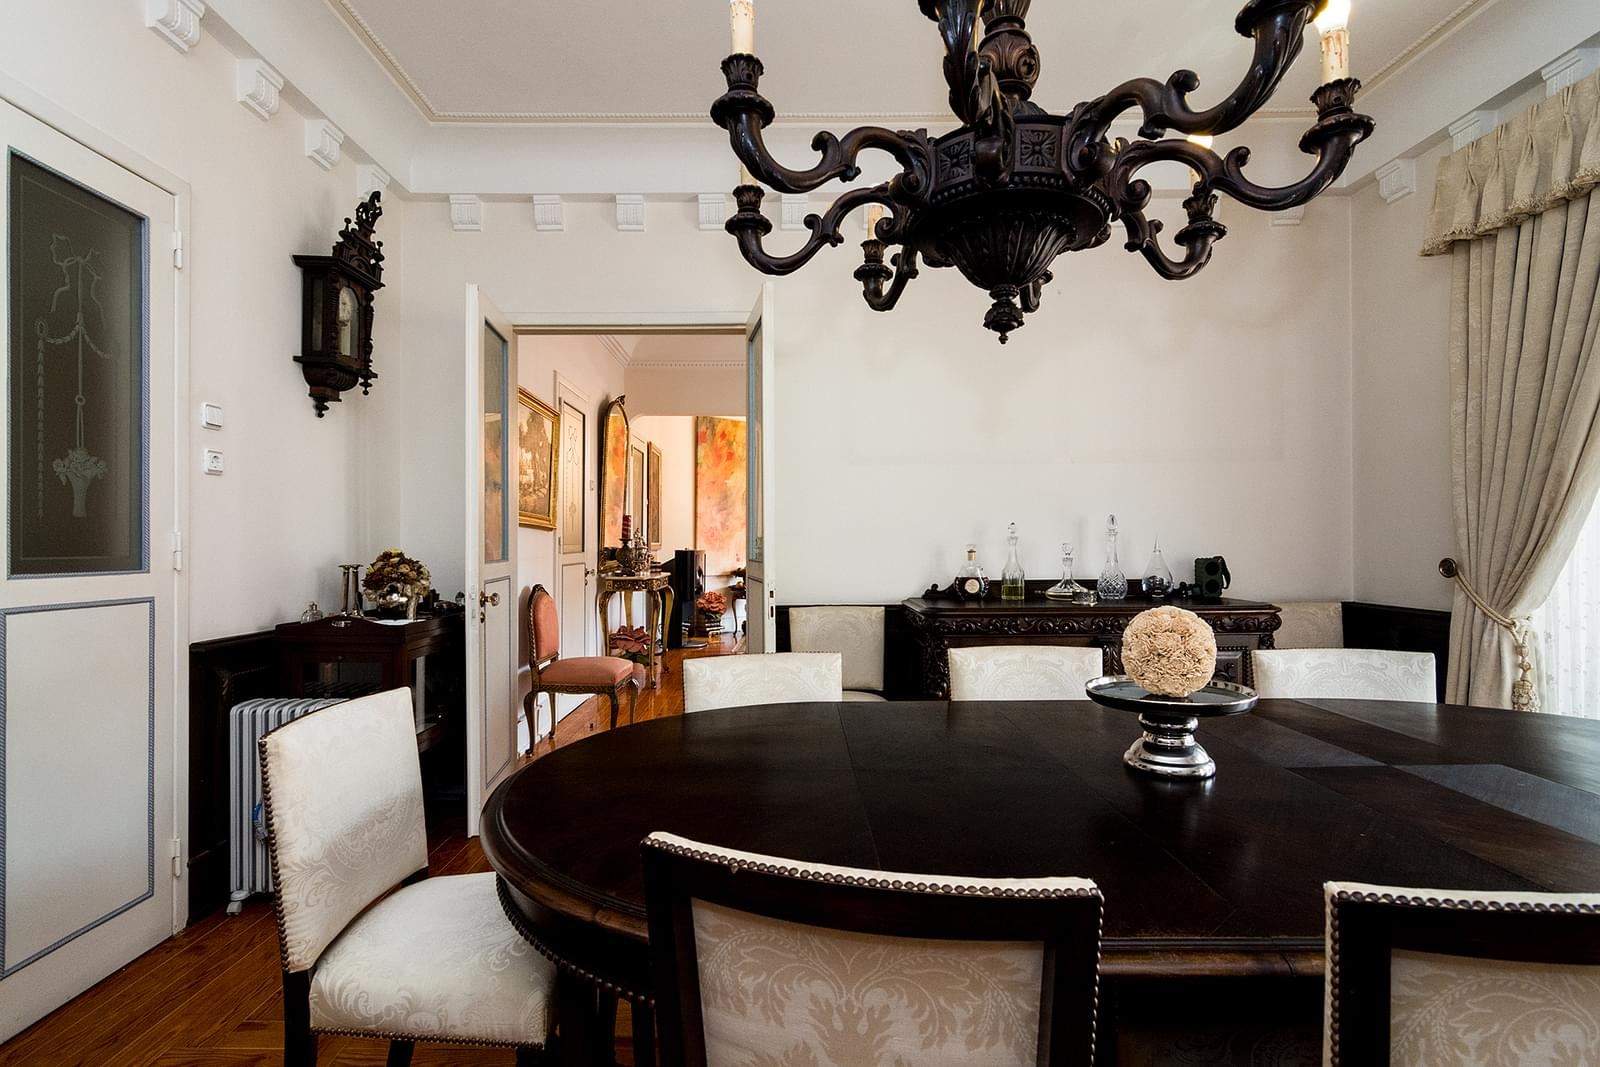 pf17510-apartamento-t4-1-lisboa-884a6f40-587e-4635-b3d5-a62ef7c248c2